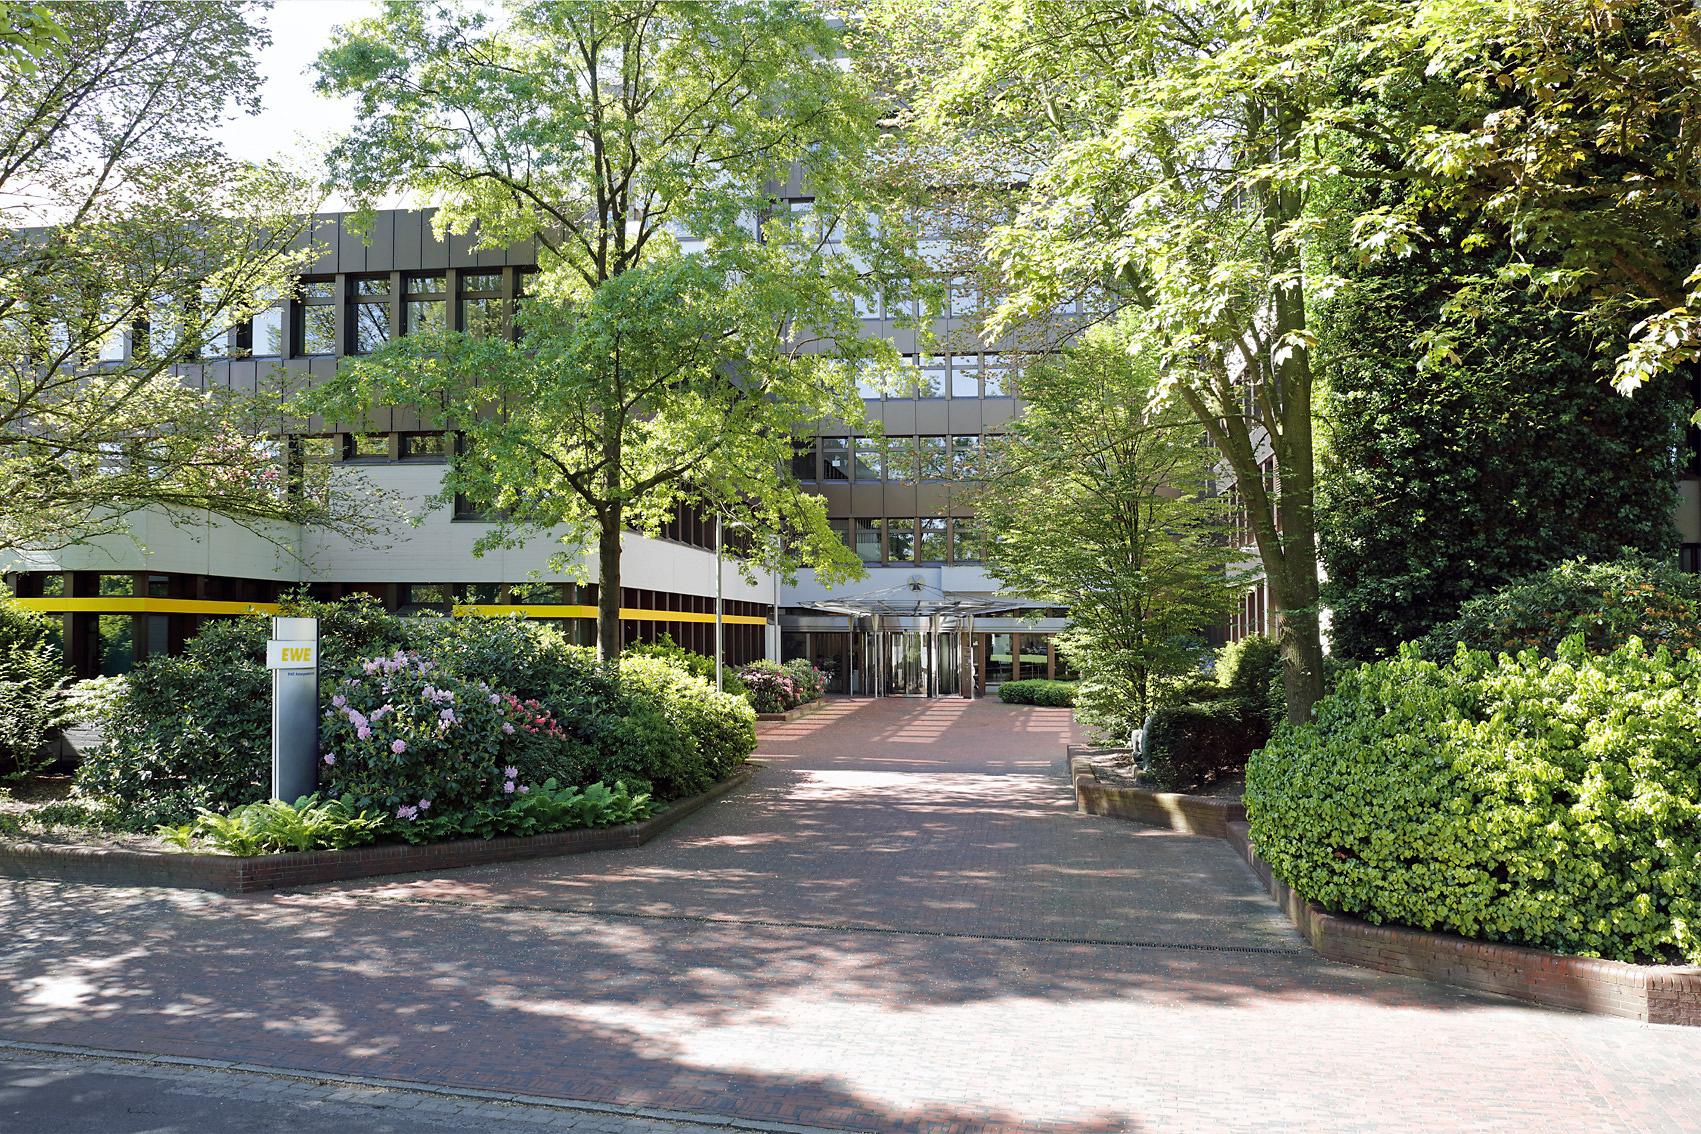 Waterstofsamenwerking tussen Nederland en Nedersaksen op komst